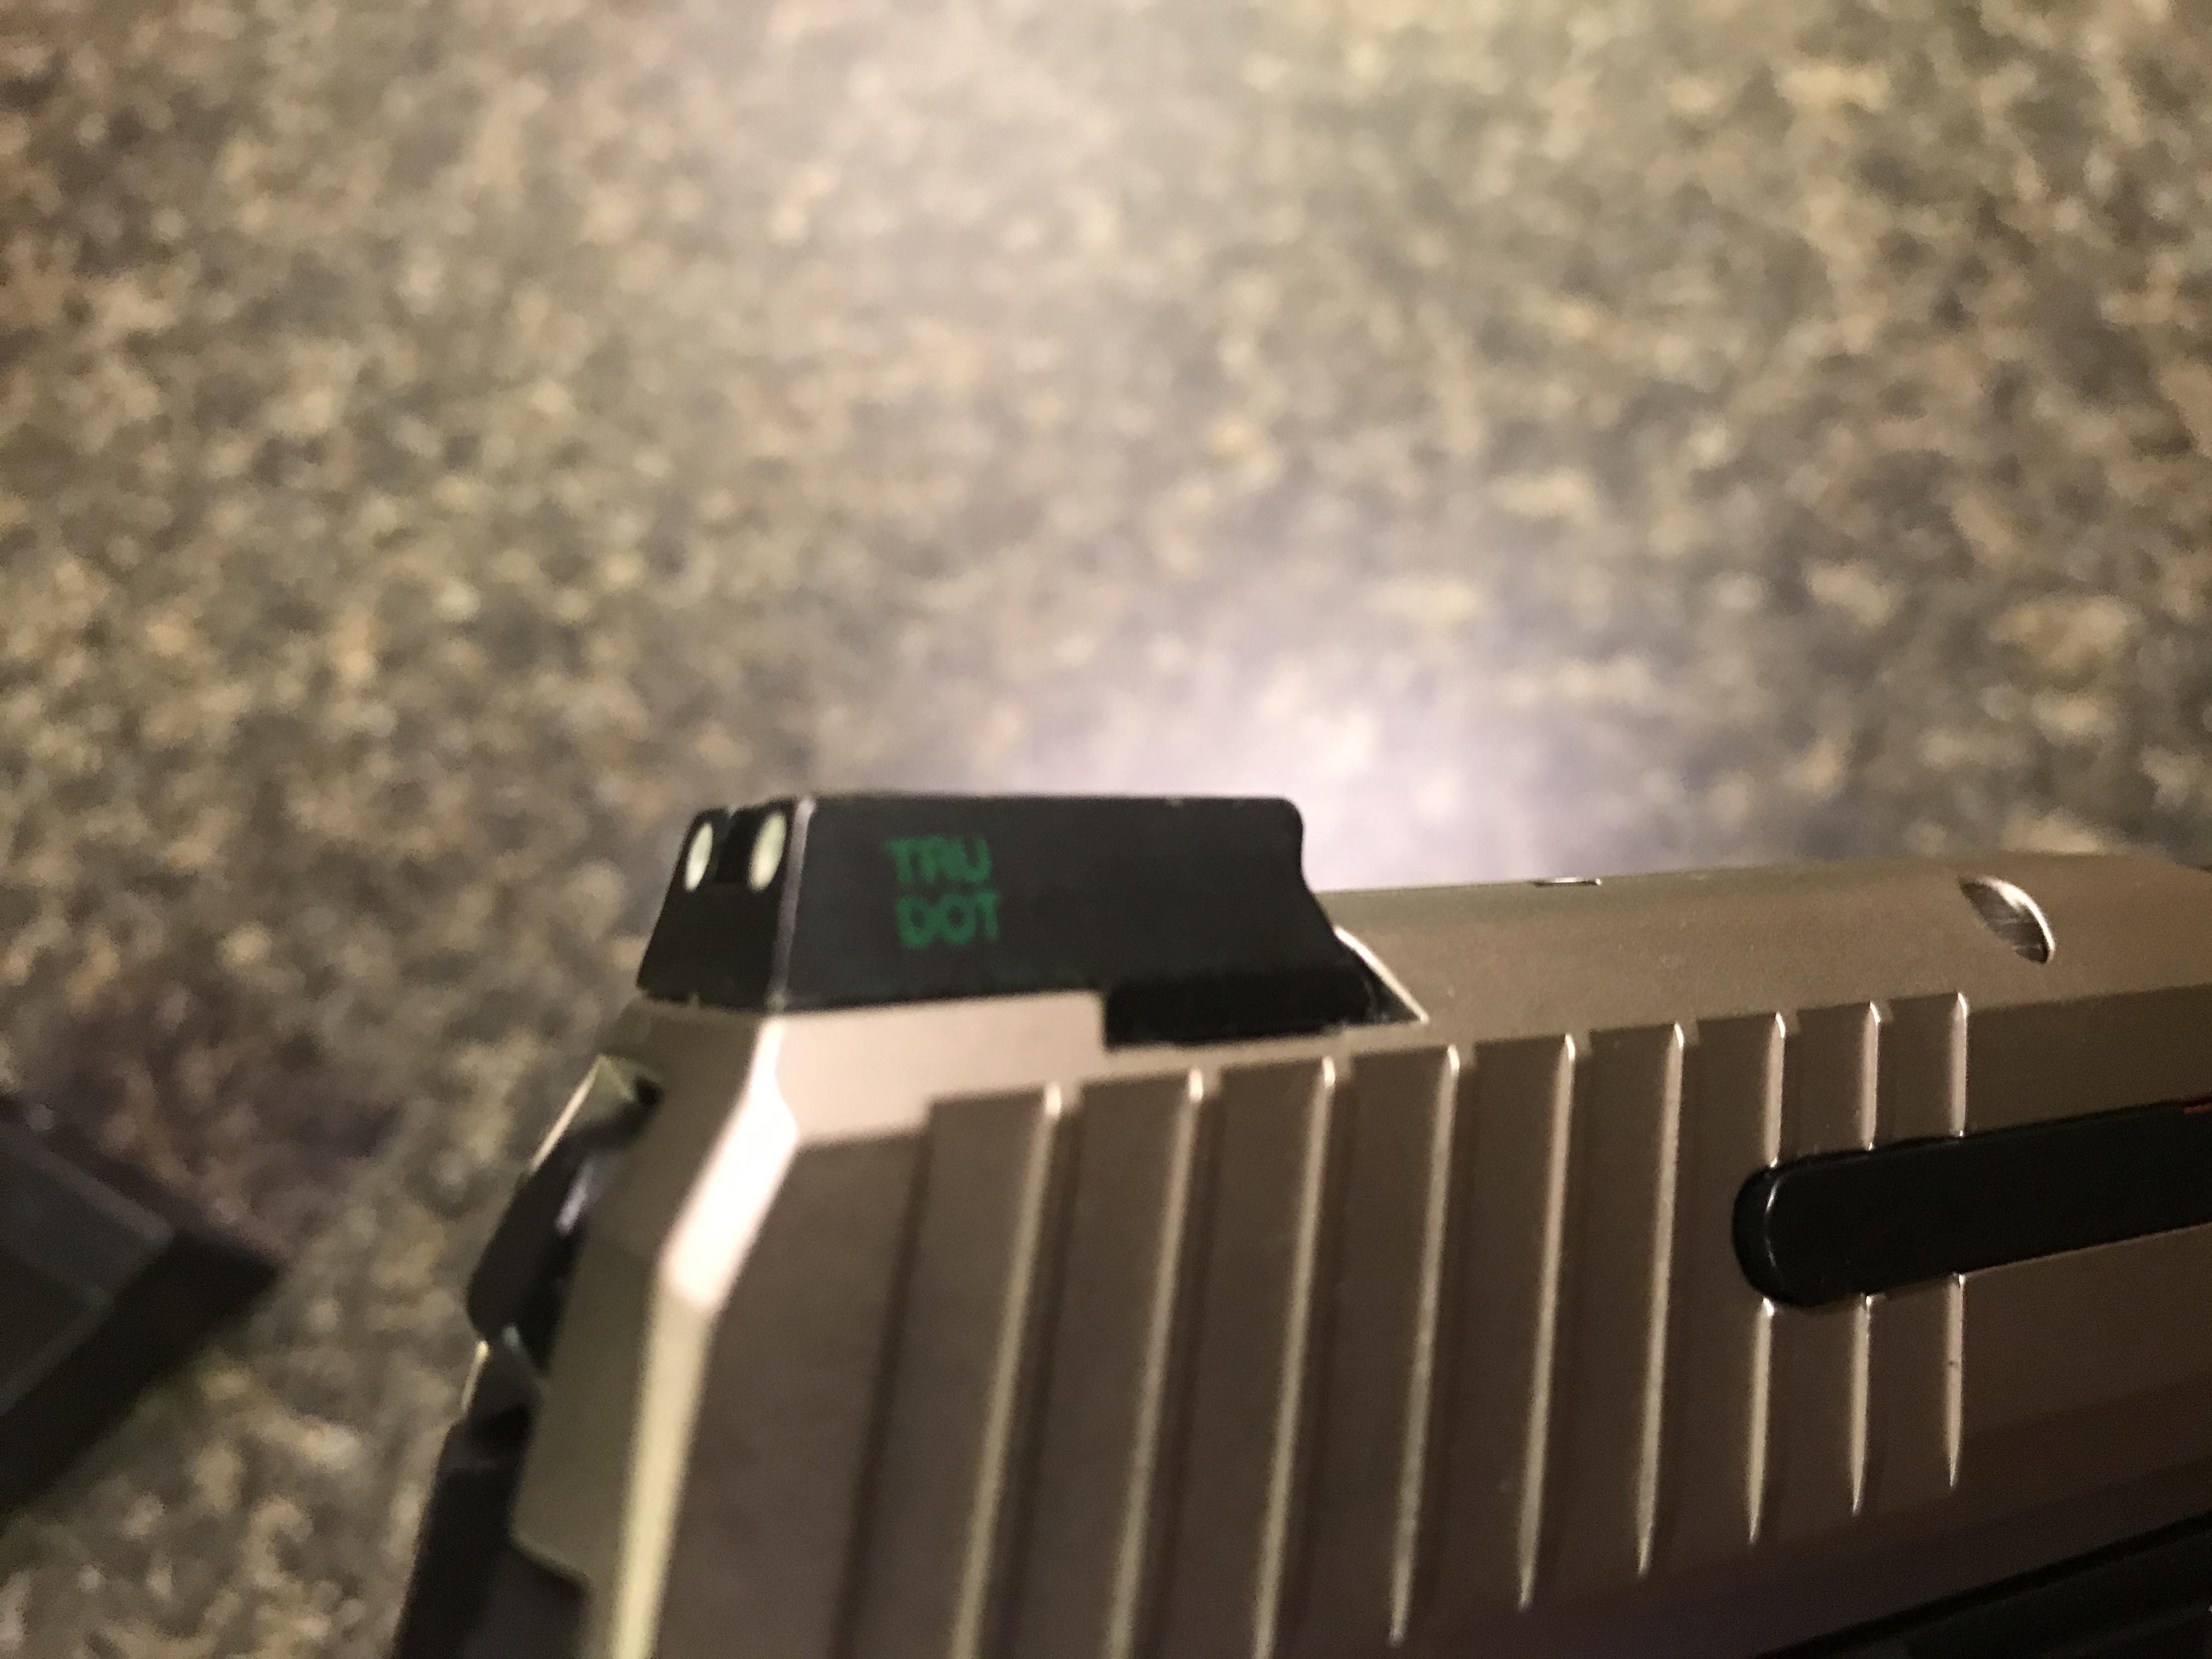 WTS:  HK45, German-made, custom finish, LEM with manual safety and night sights-4a371b0e-0e65-440e-ba65-2e1b0fc805e9.jpeg